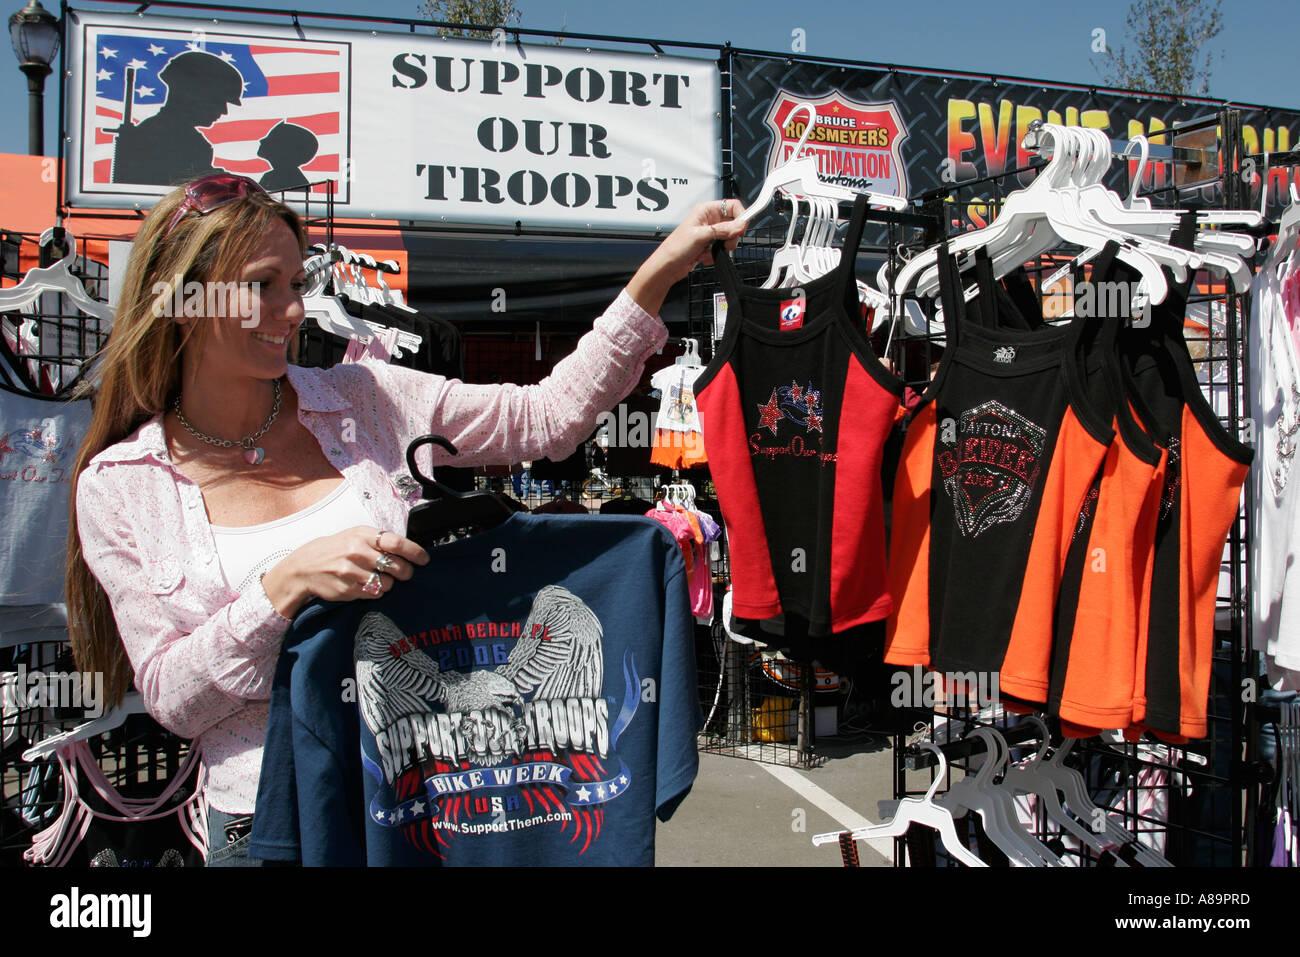 cb1cddf2f Daytona Beach Florida US 1 Destination Daytona Bike Week Support Our Troops  promotion clothing